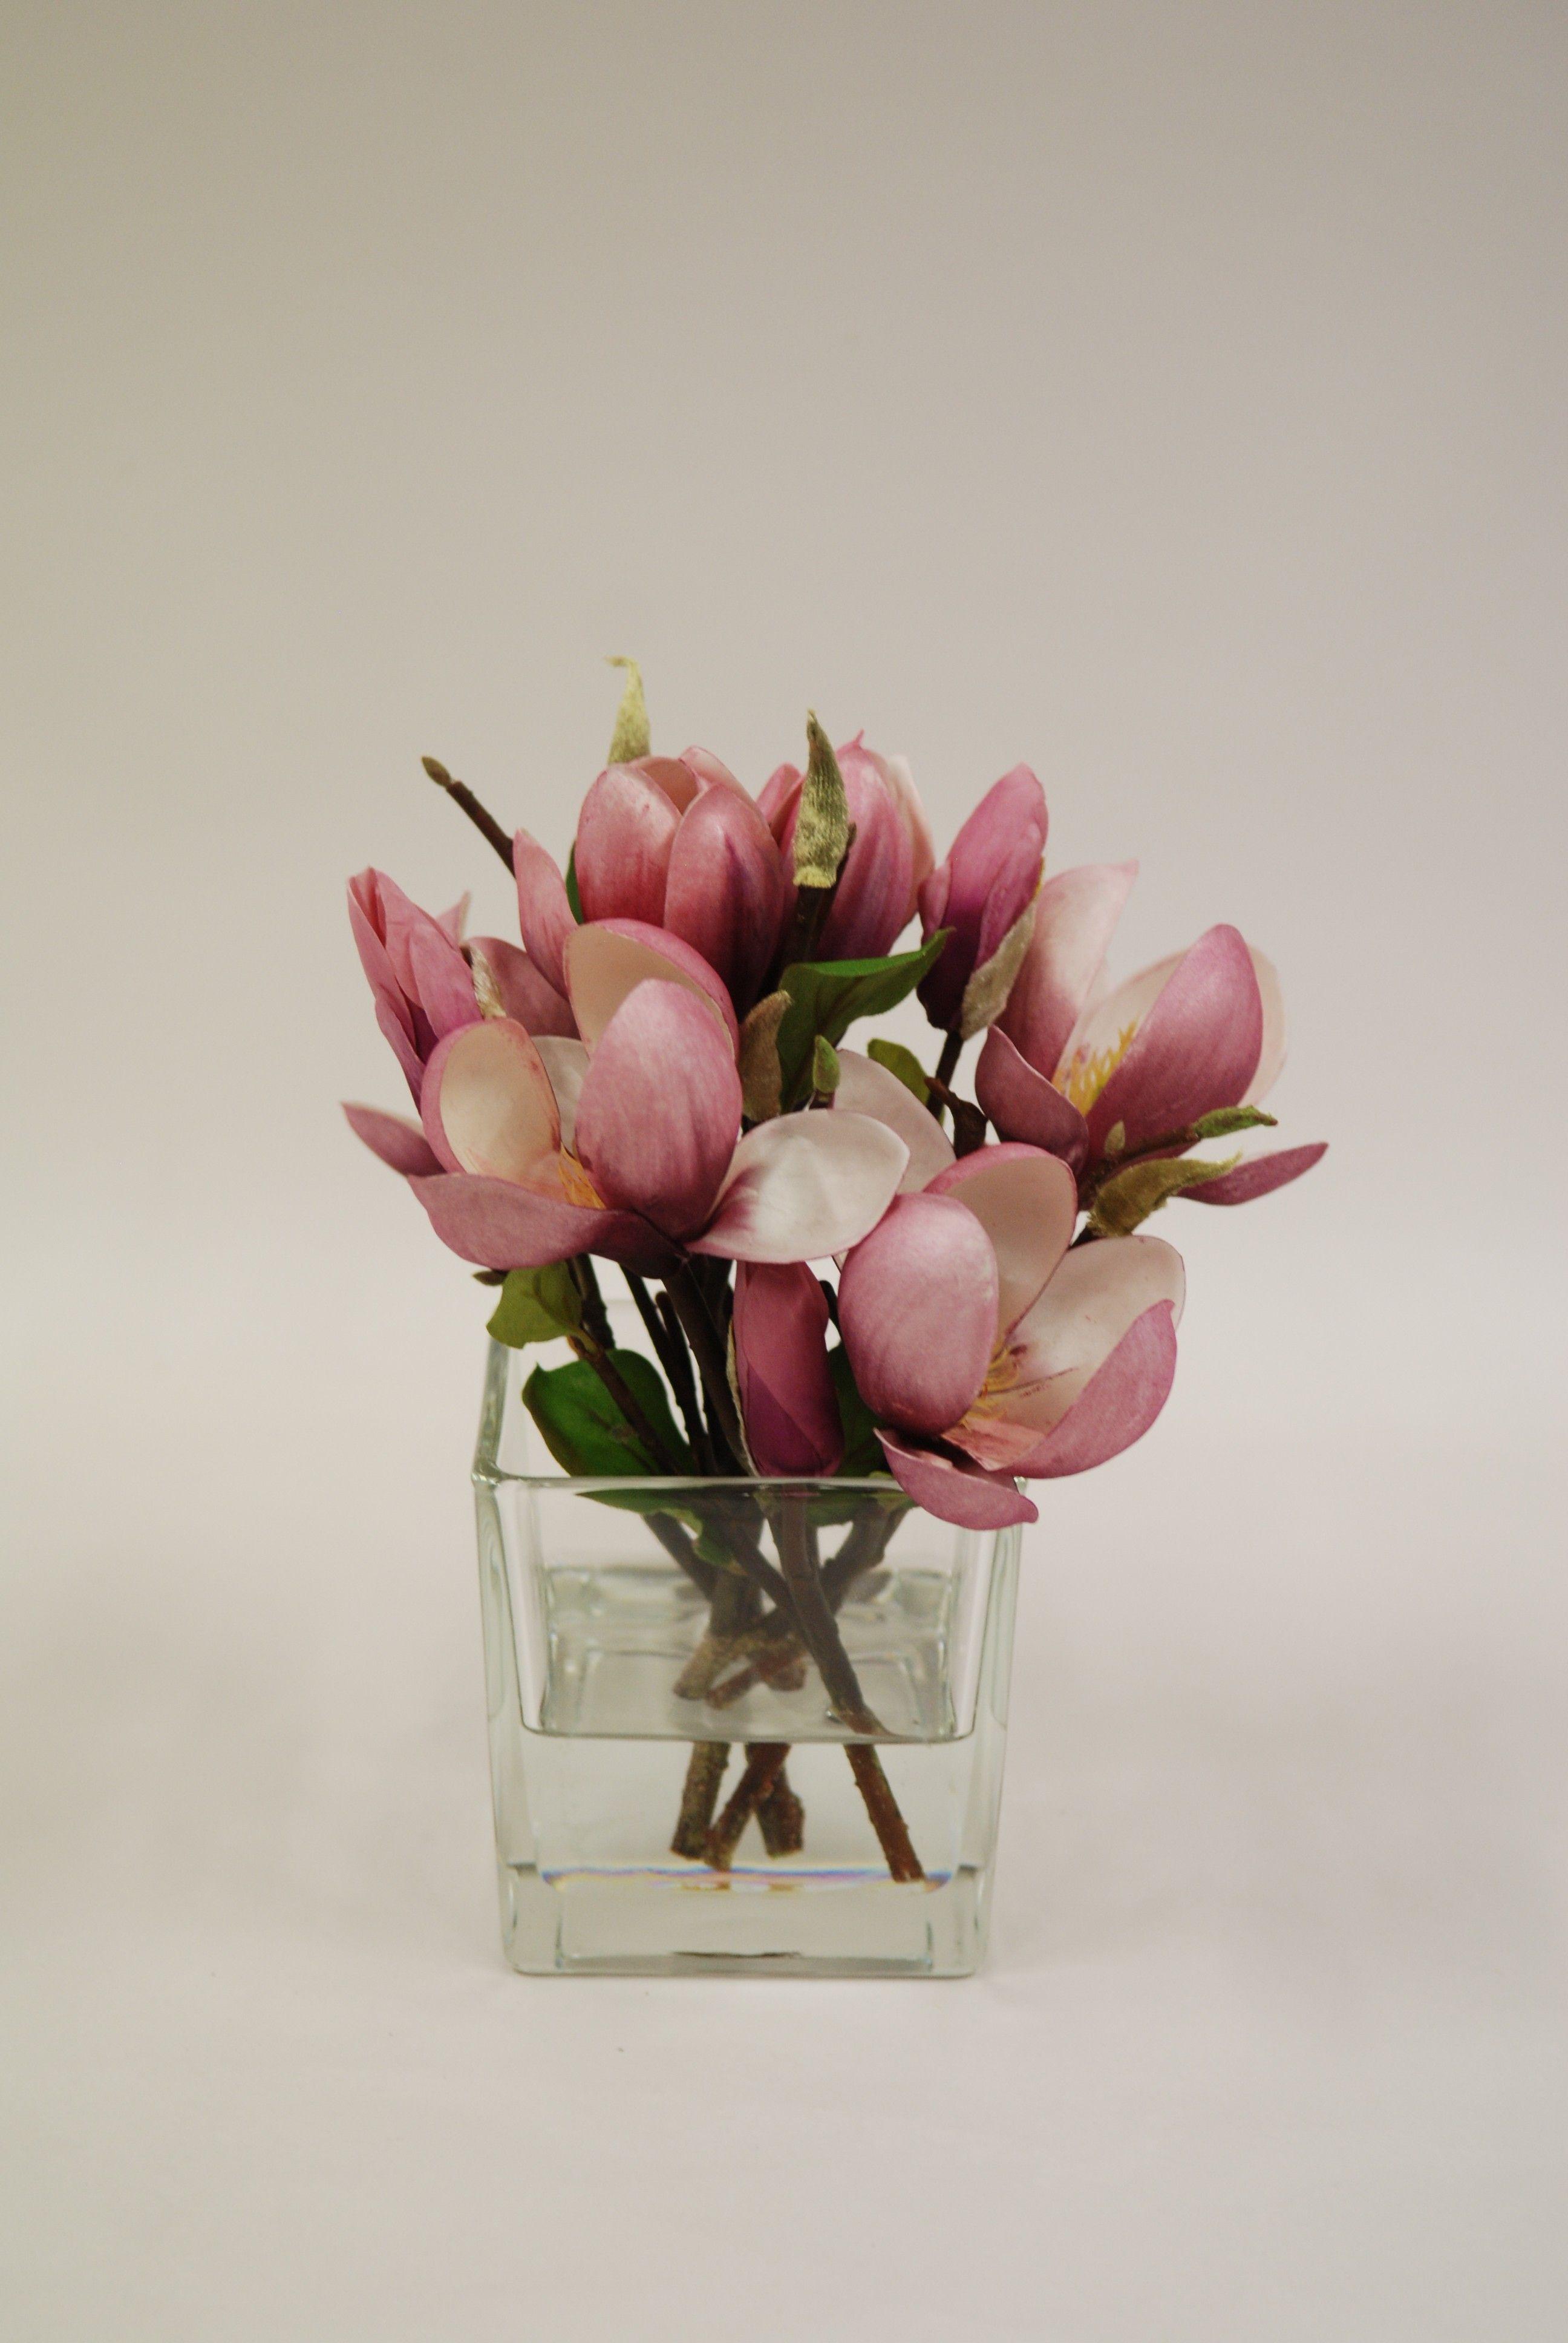 composition carree magnolia sign e emilio robba deco nature fleurs plantes pinterest. Black Bedroom Furniture Sets. Home Design Ideas